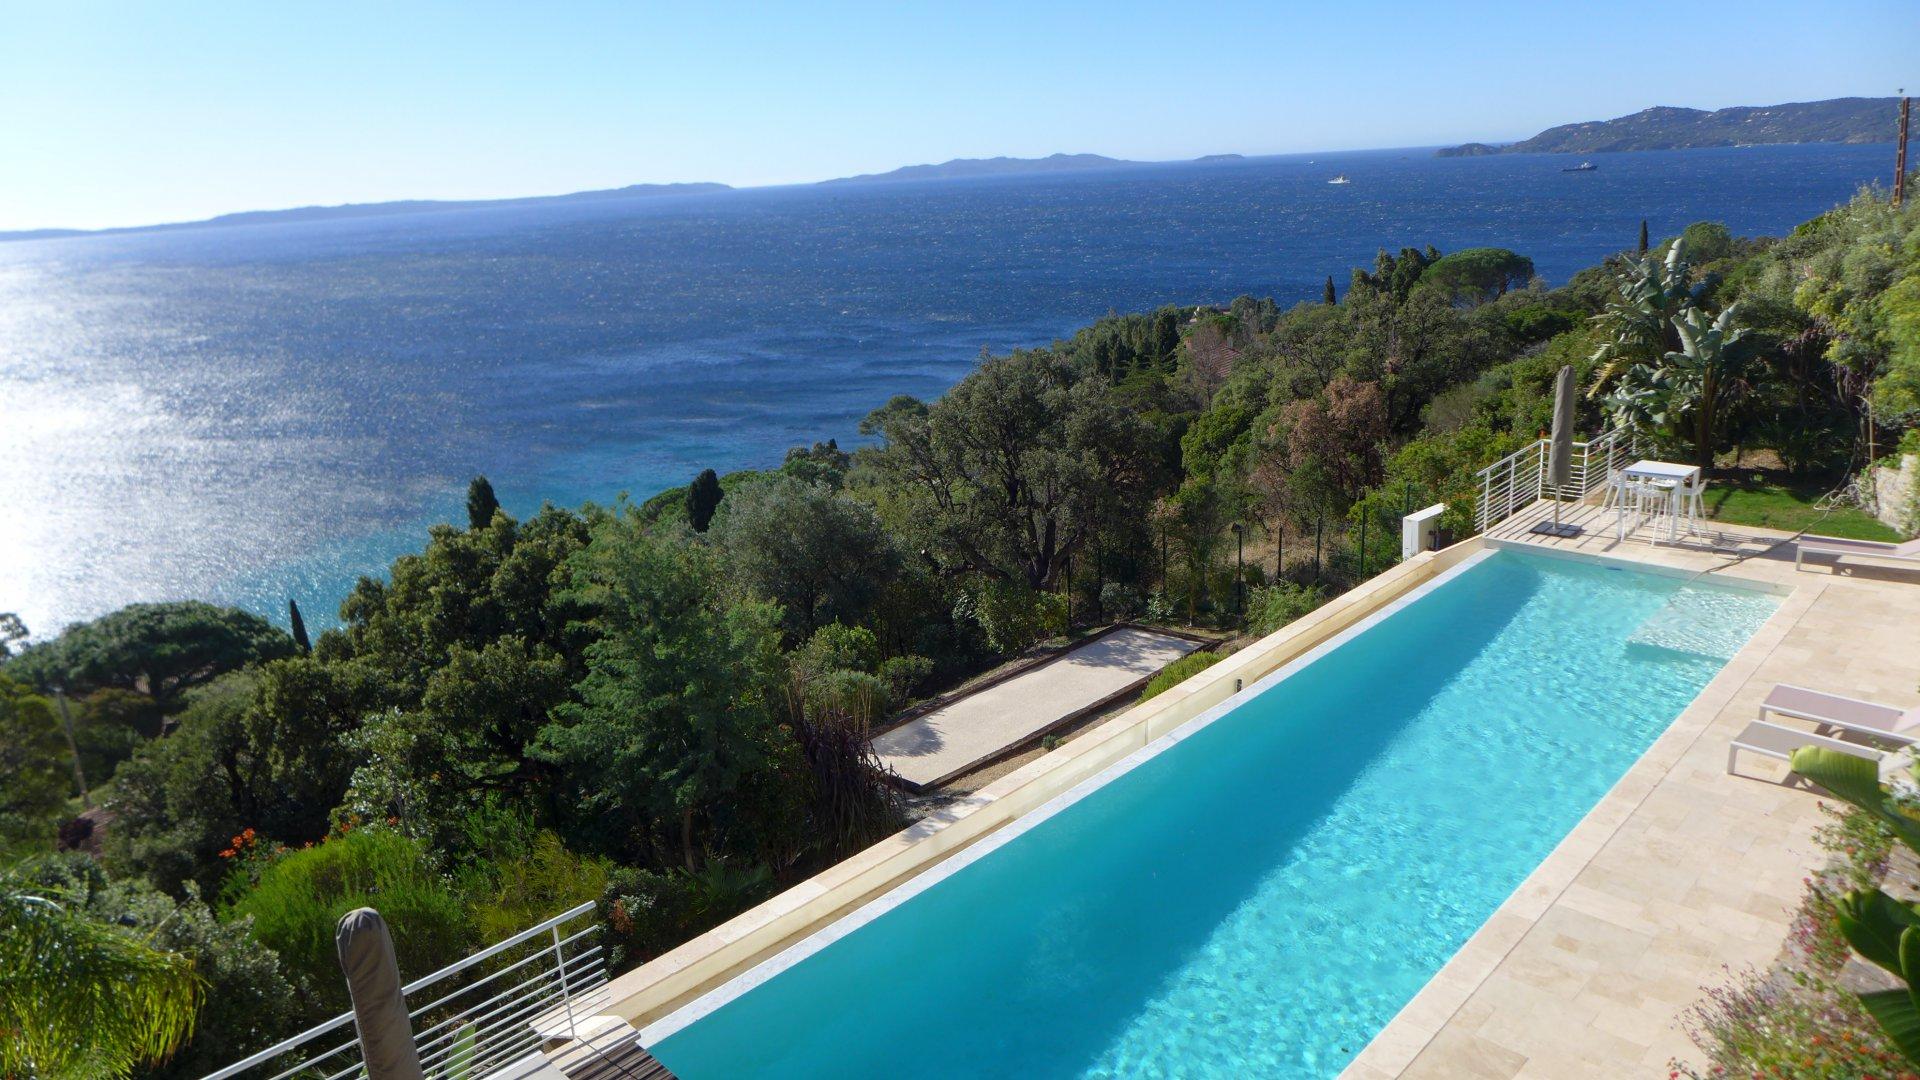 Contemporary villa with stunning view le Lavandou Var Provence